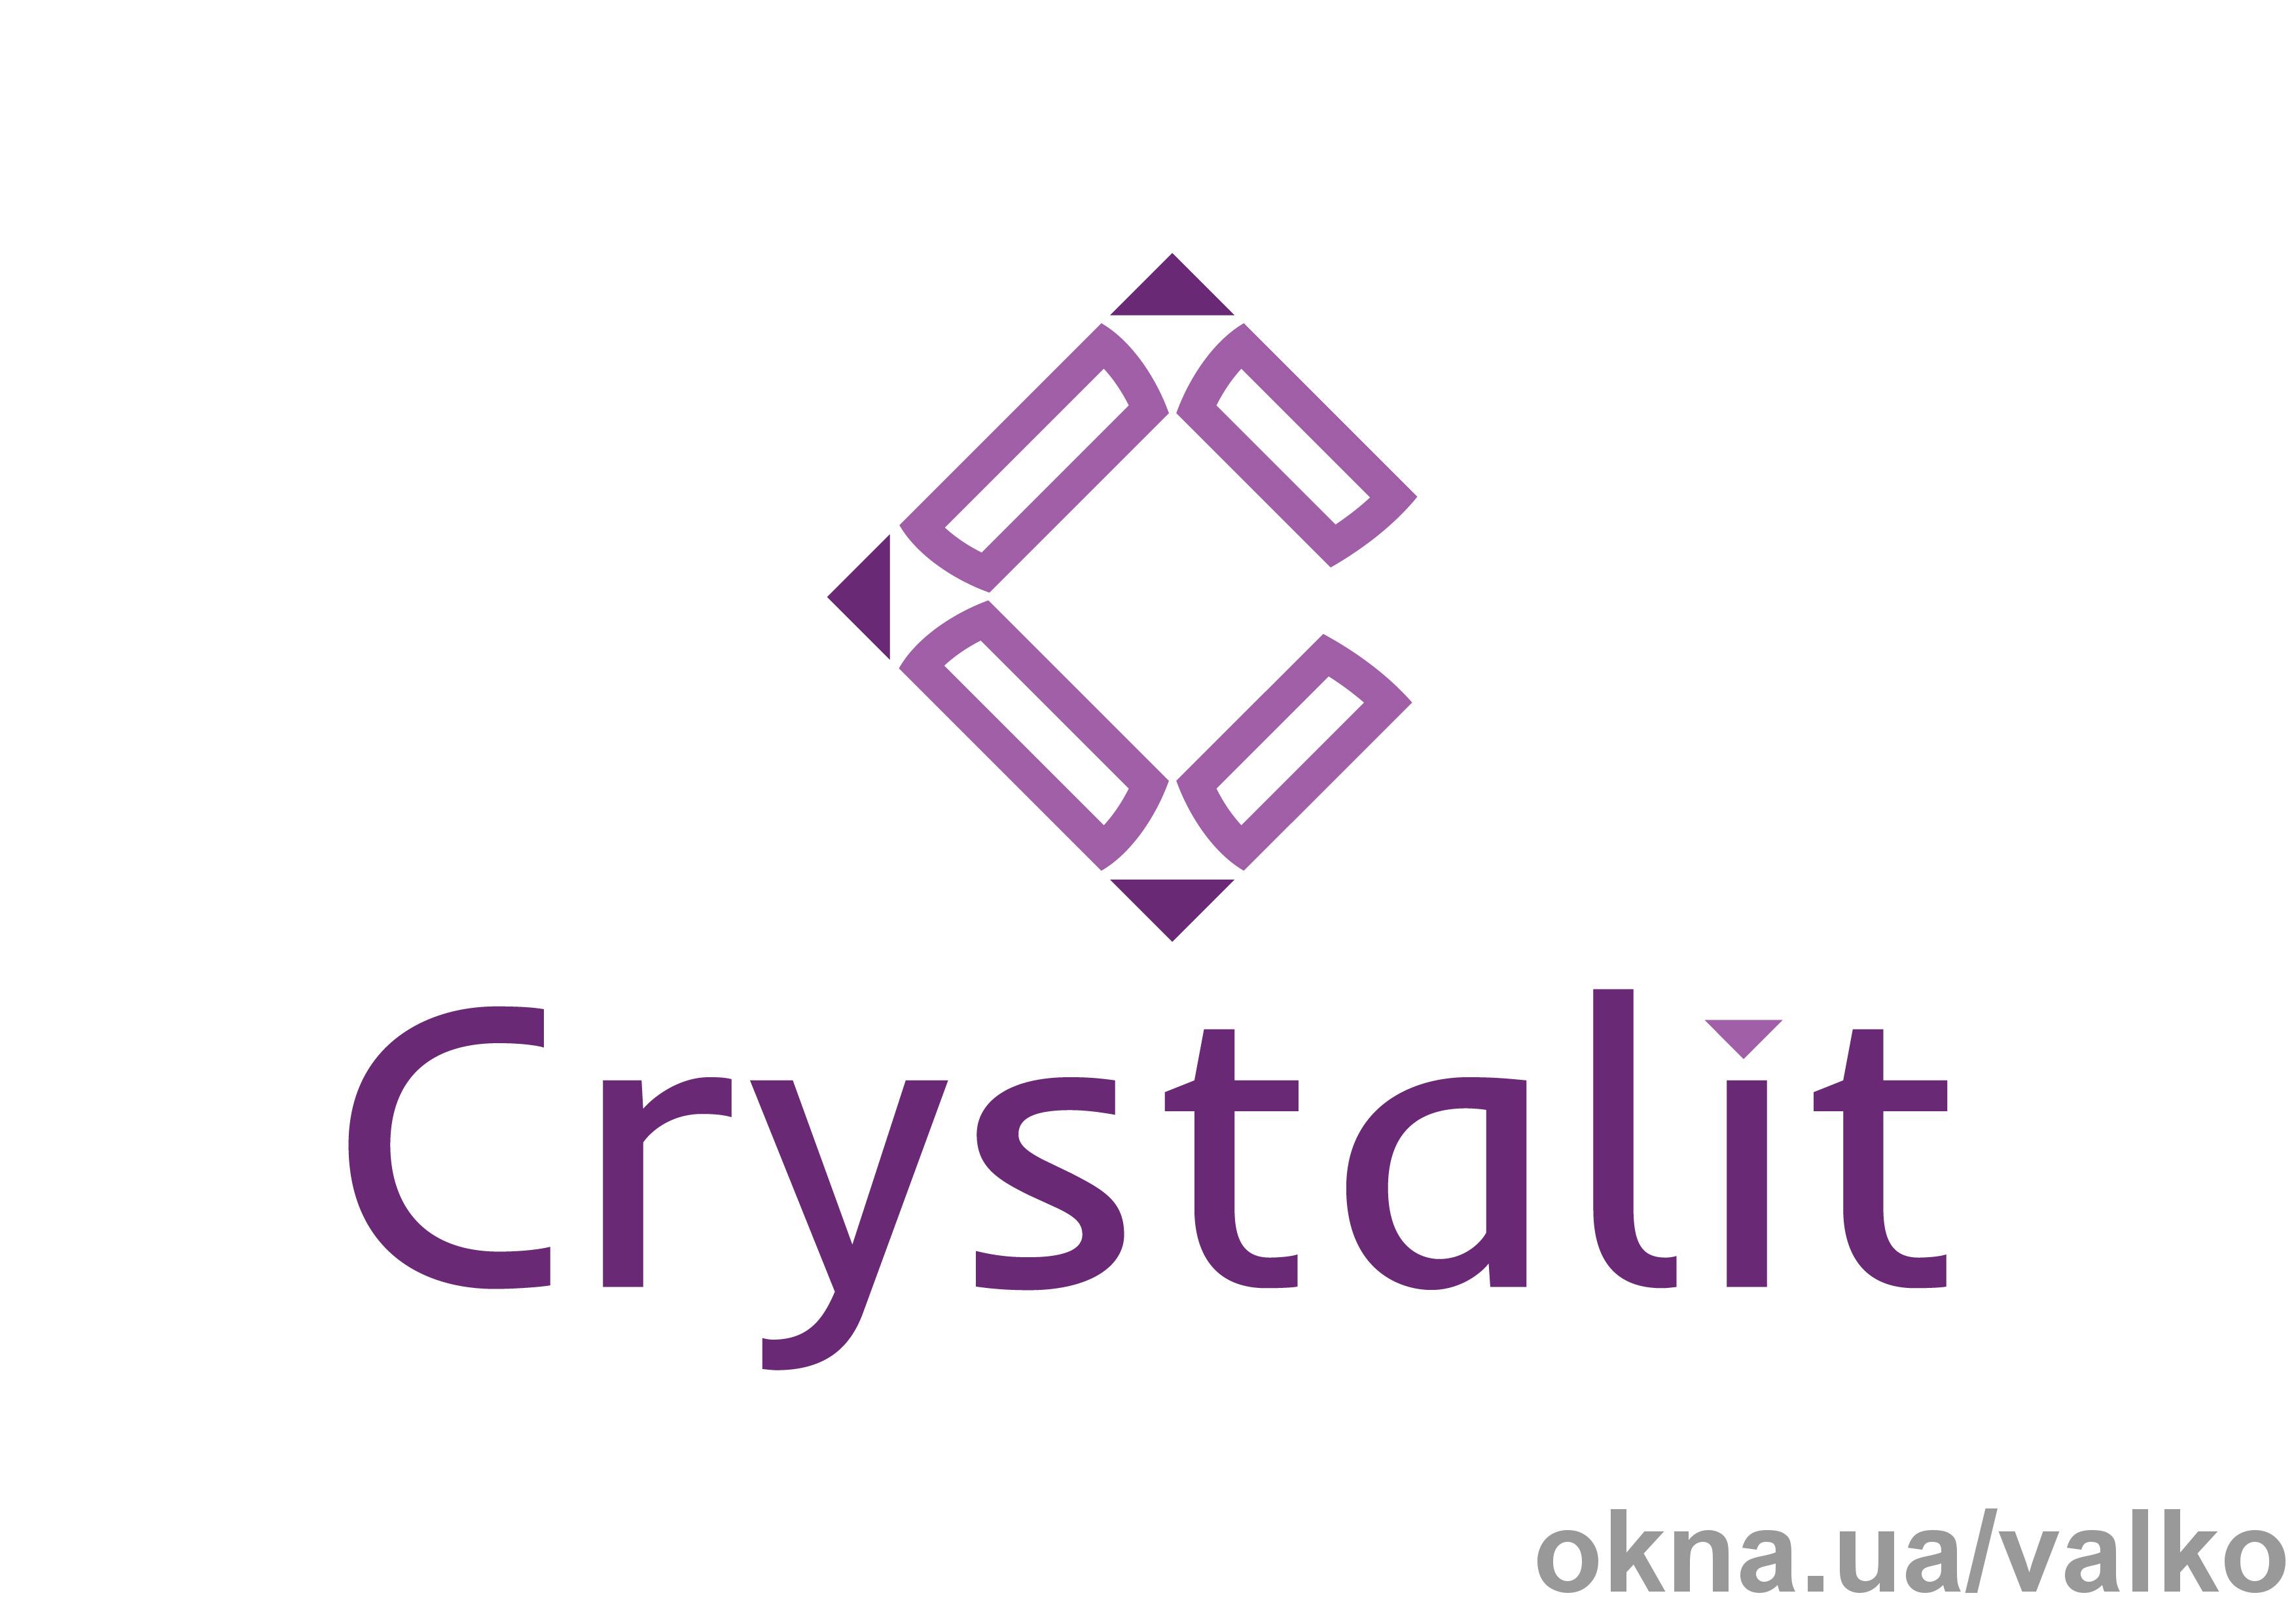 Crystalit